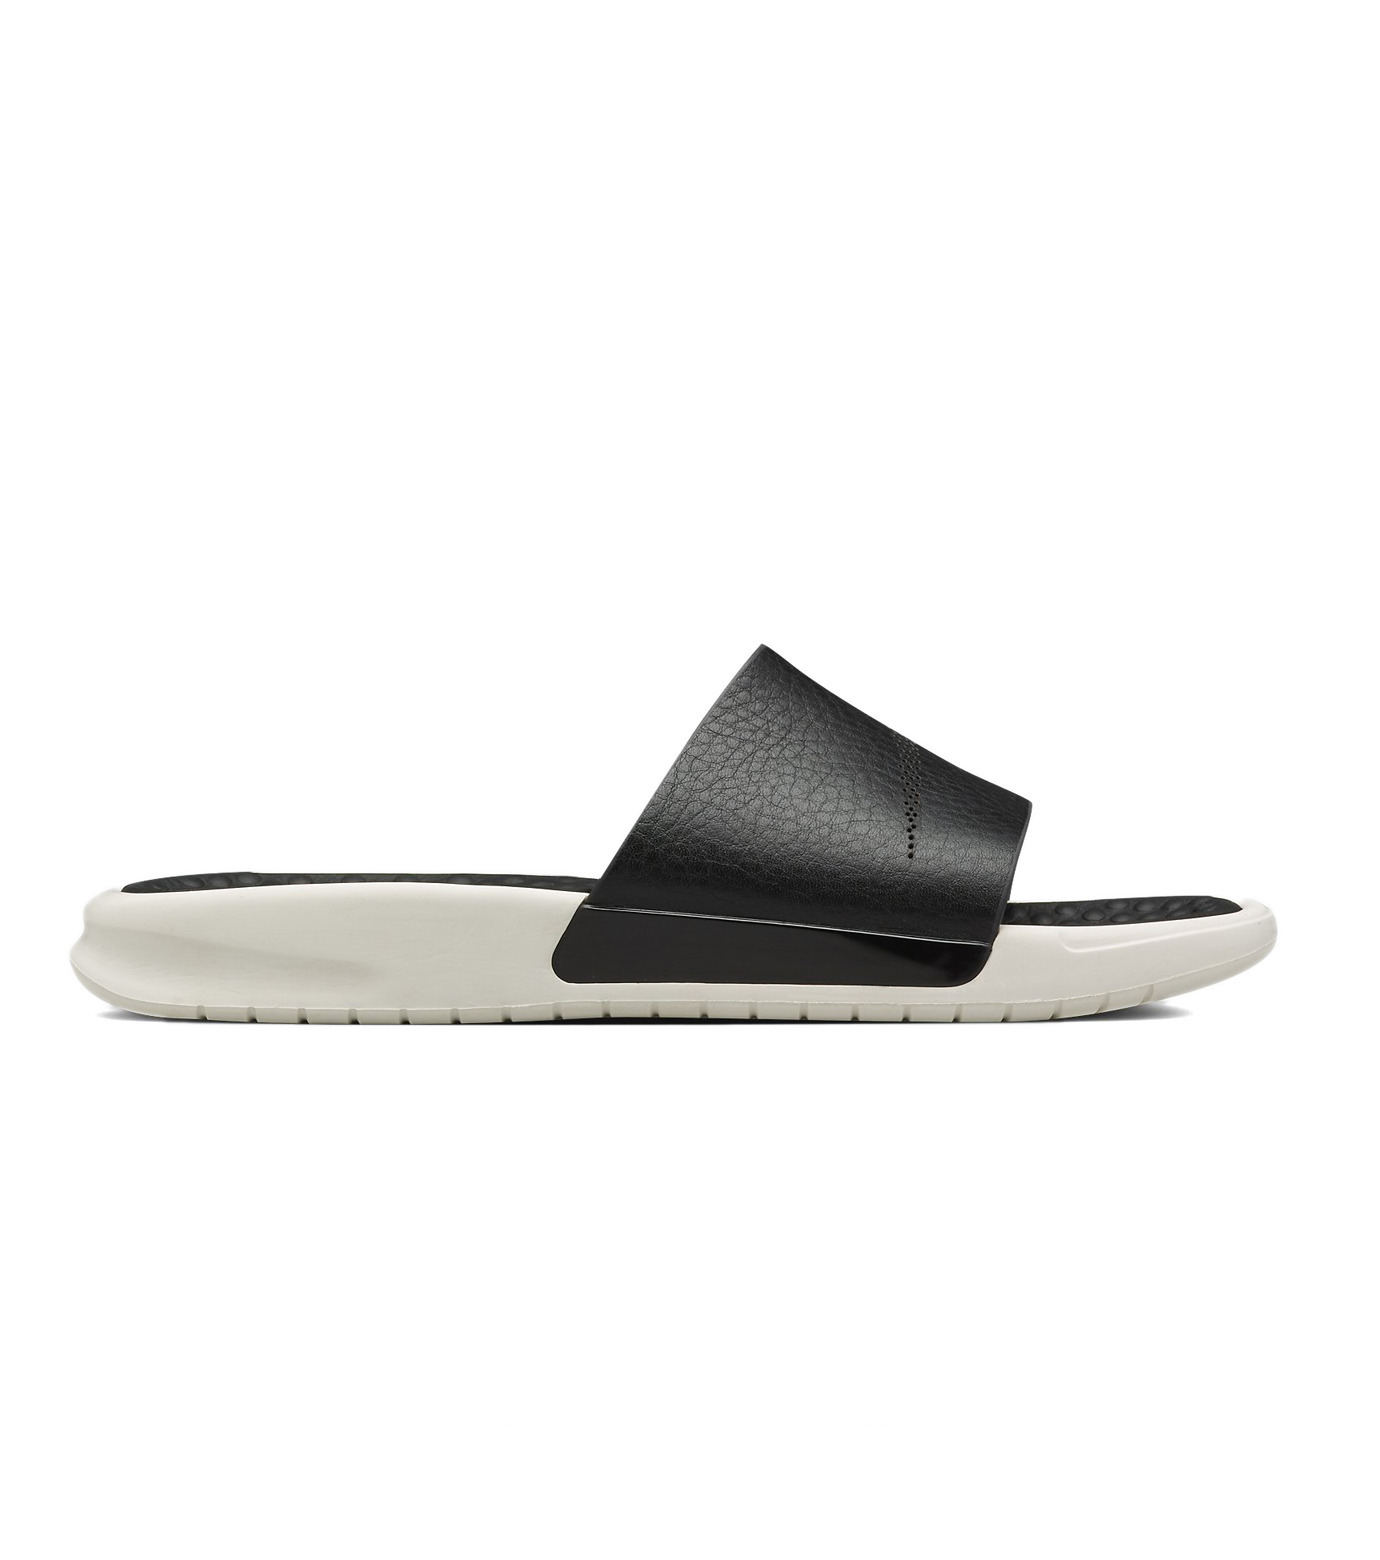 NIKE(ナイキ)のWMNS BENASSI SLIDE LUX-BLACK(シューズ/shoes)-818738-001-13 拡大詳細画像1